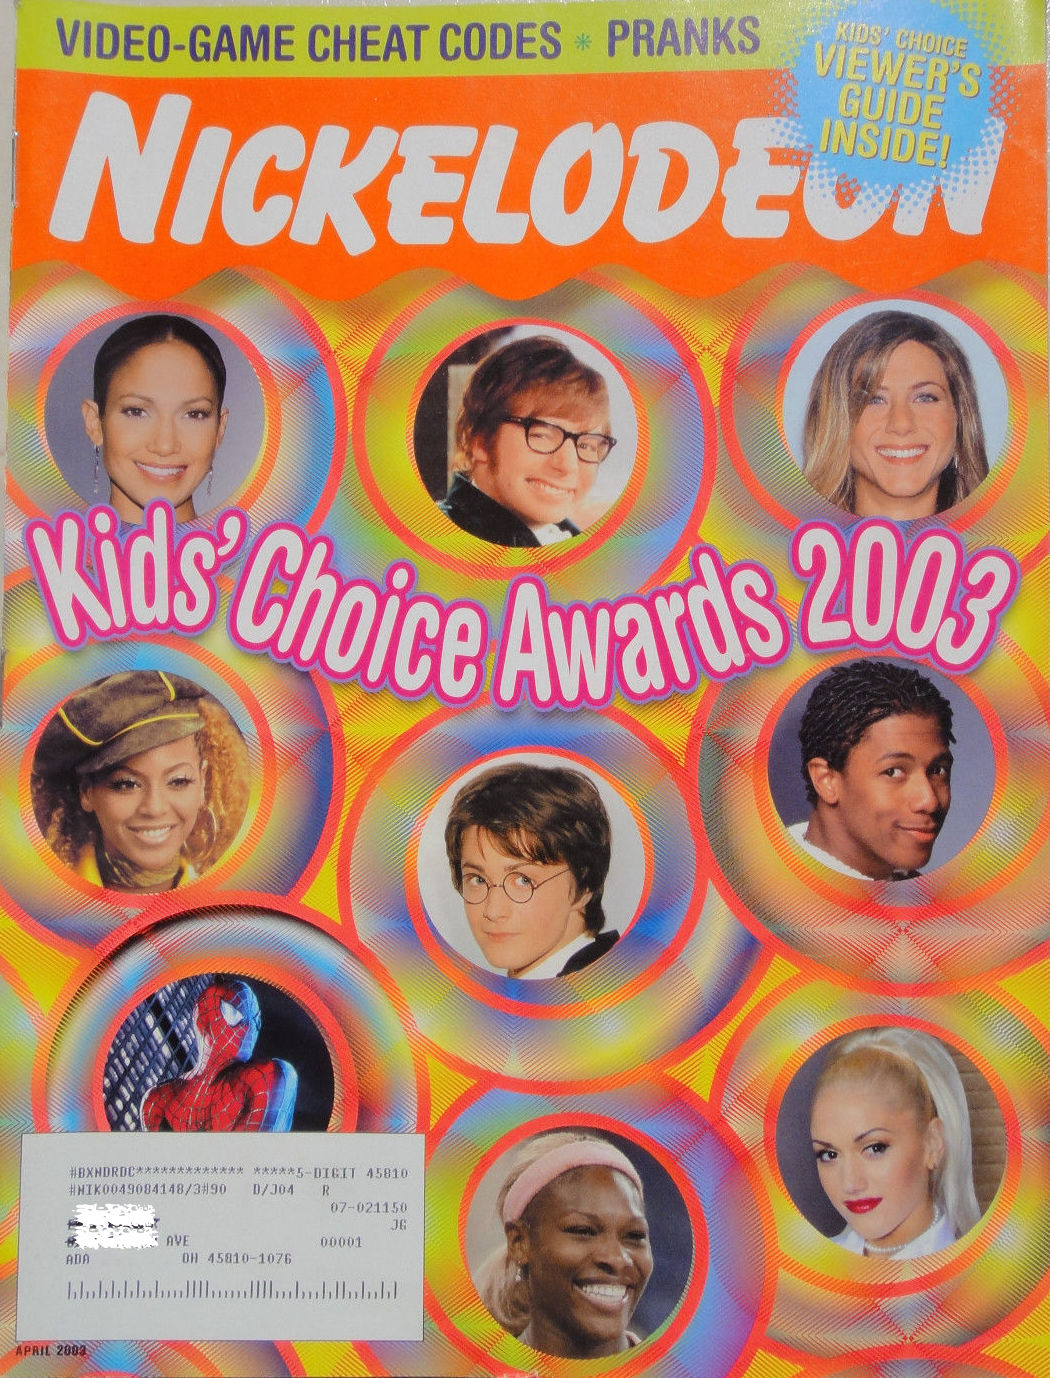 Nickelodeon Magazine Cover April 2003 Kids Choice Awards